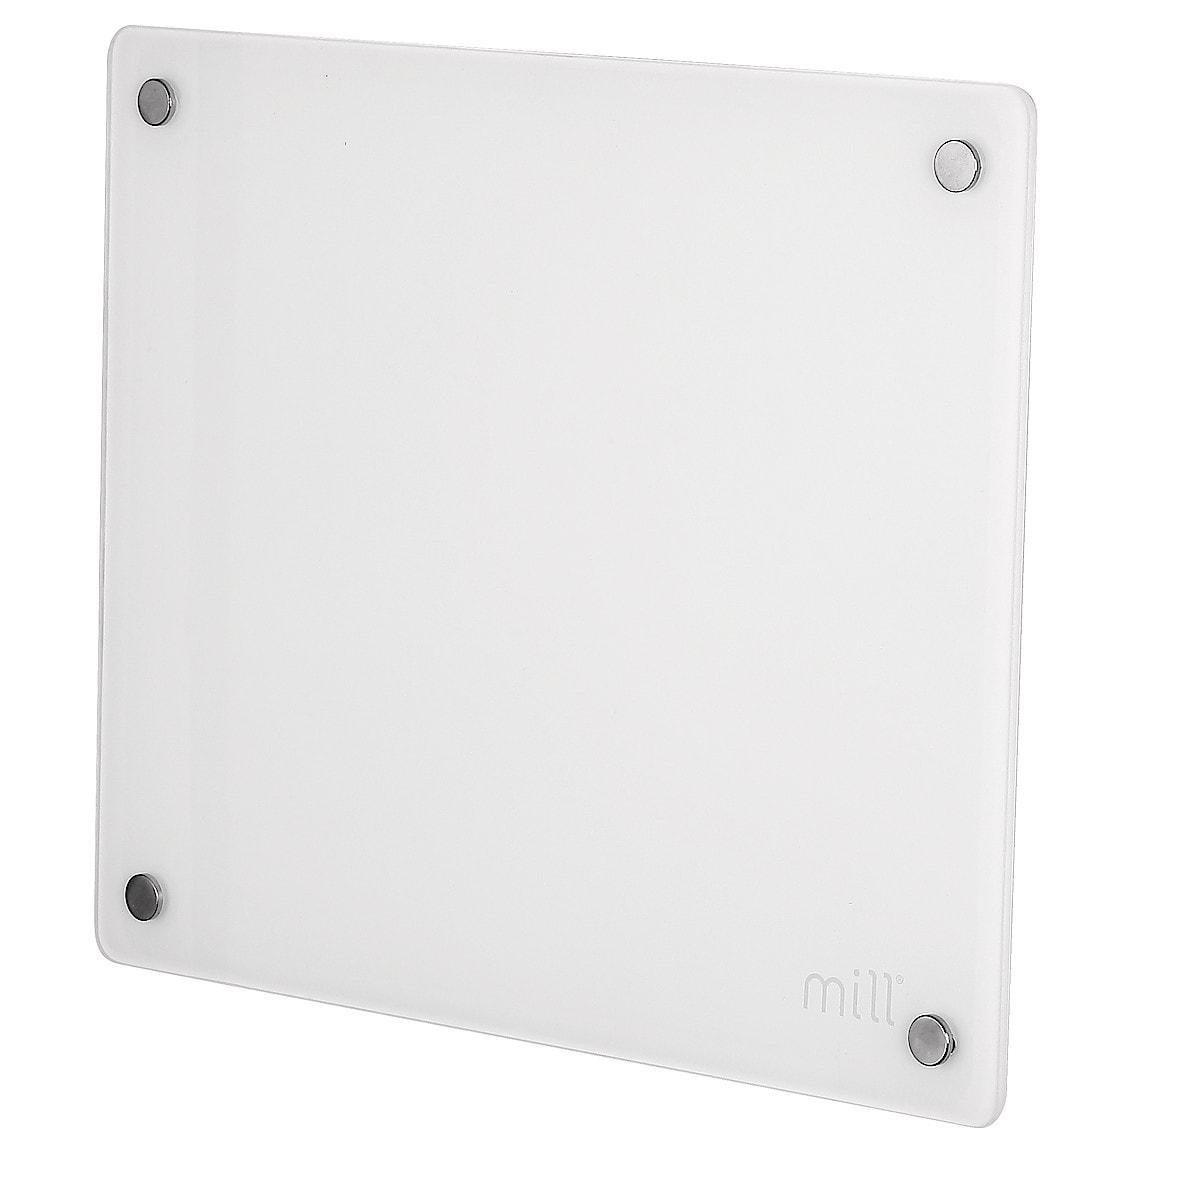 Mill MB250 Varmeovn med glassfront, 250 W, 230 V